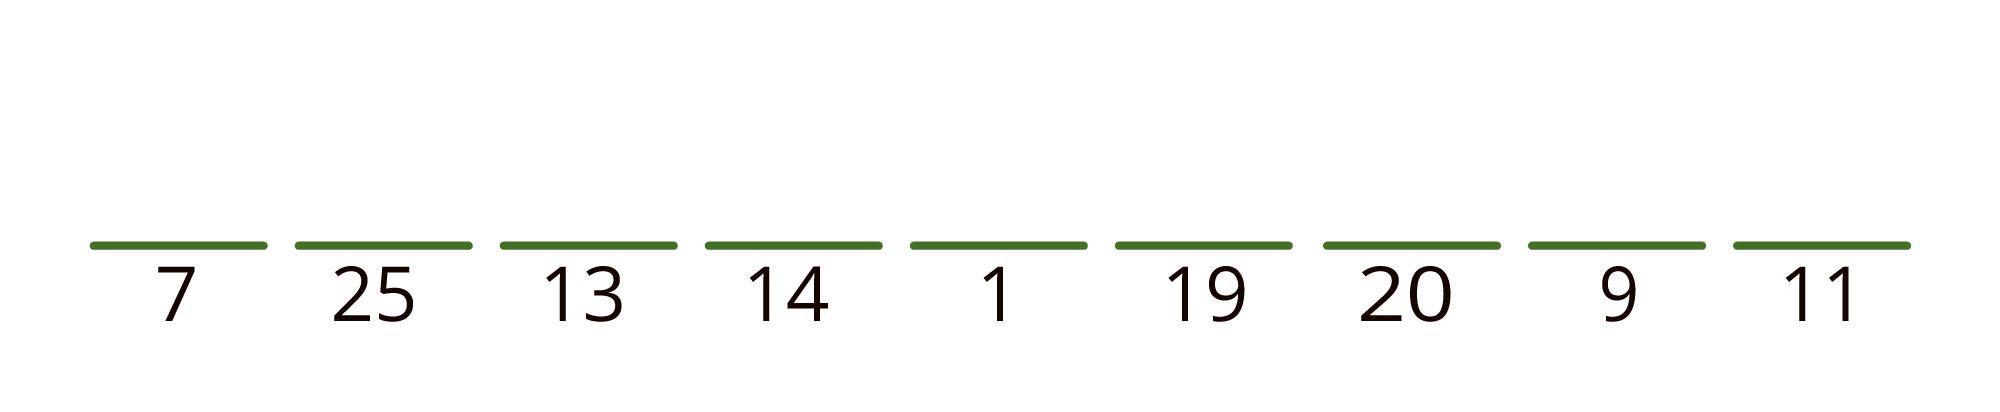 7, 25, 13, 14, 1, 19, 20, 9, 11